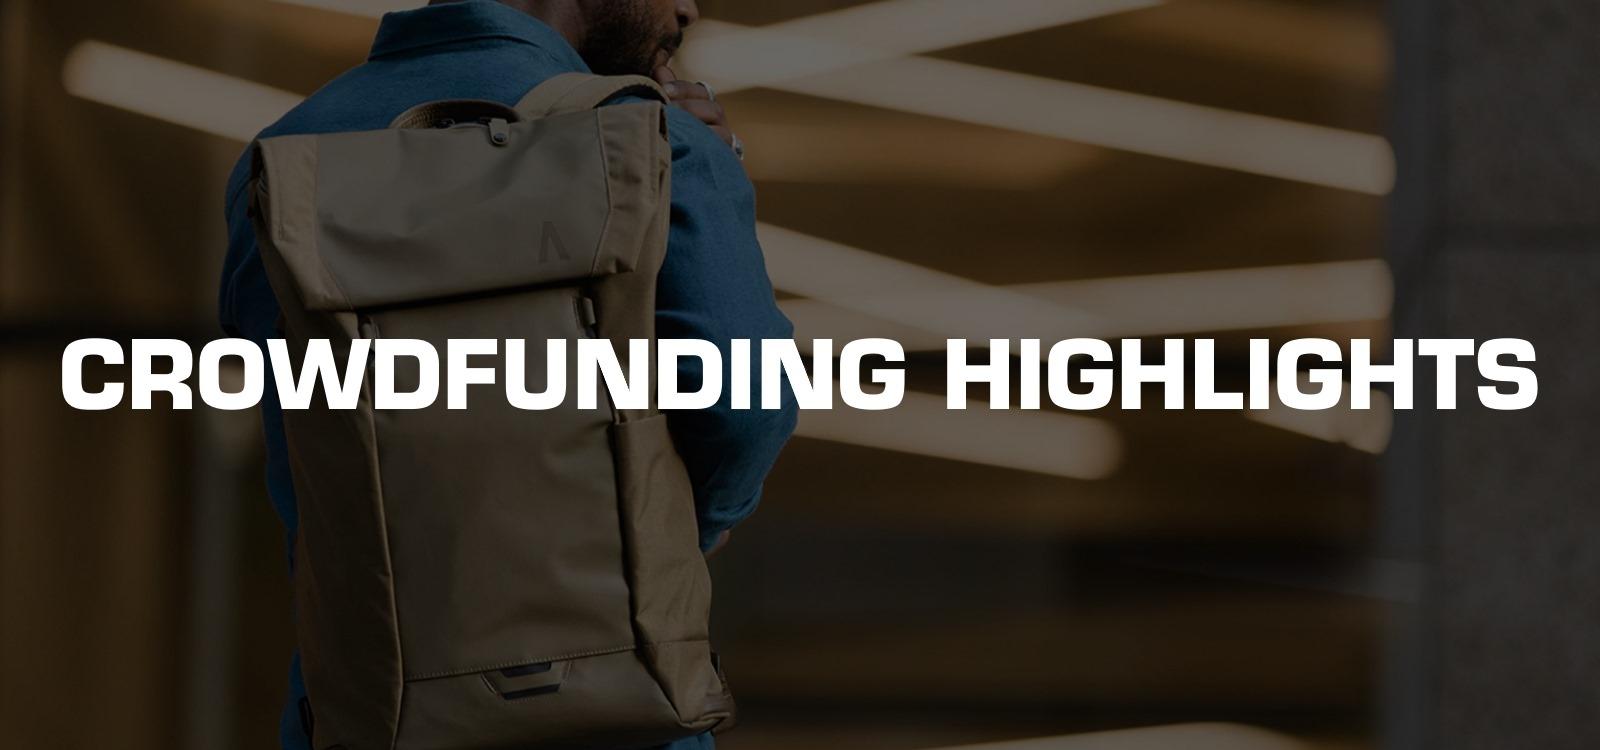 Crowdfunding Highlights